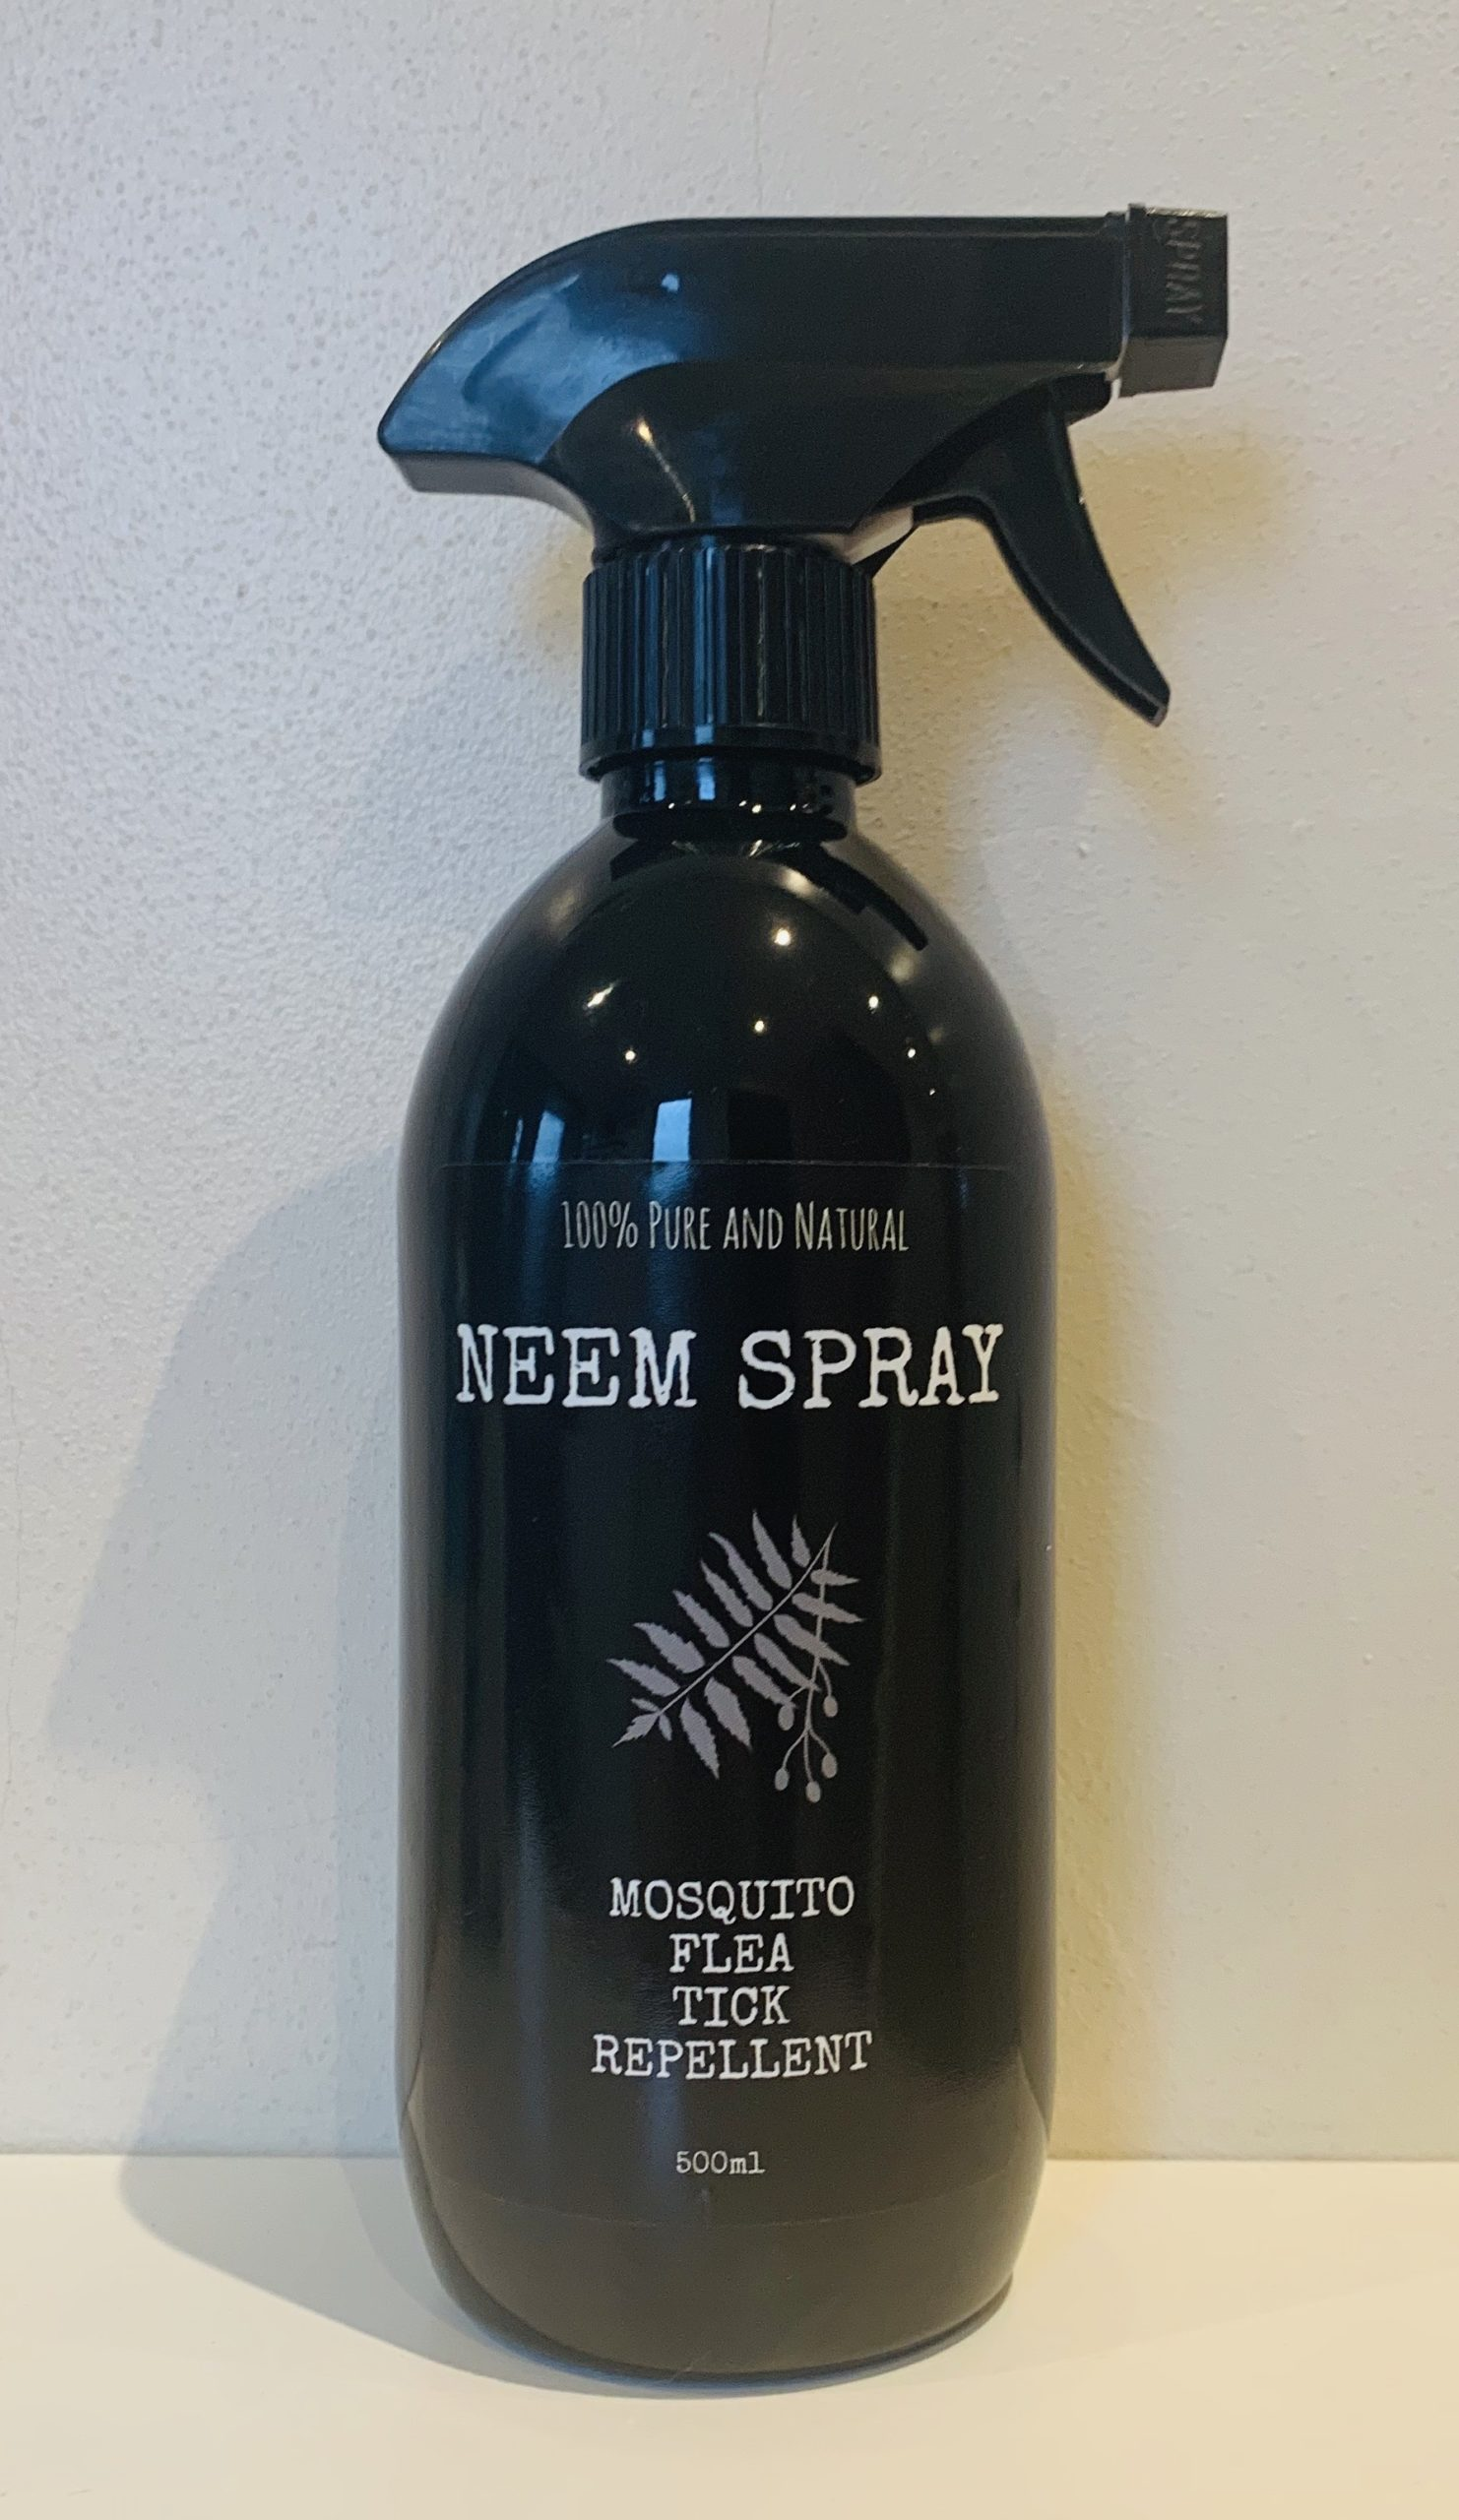 Neem Spray for dogs